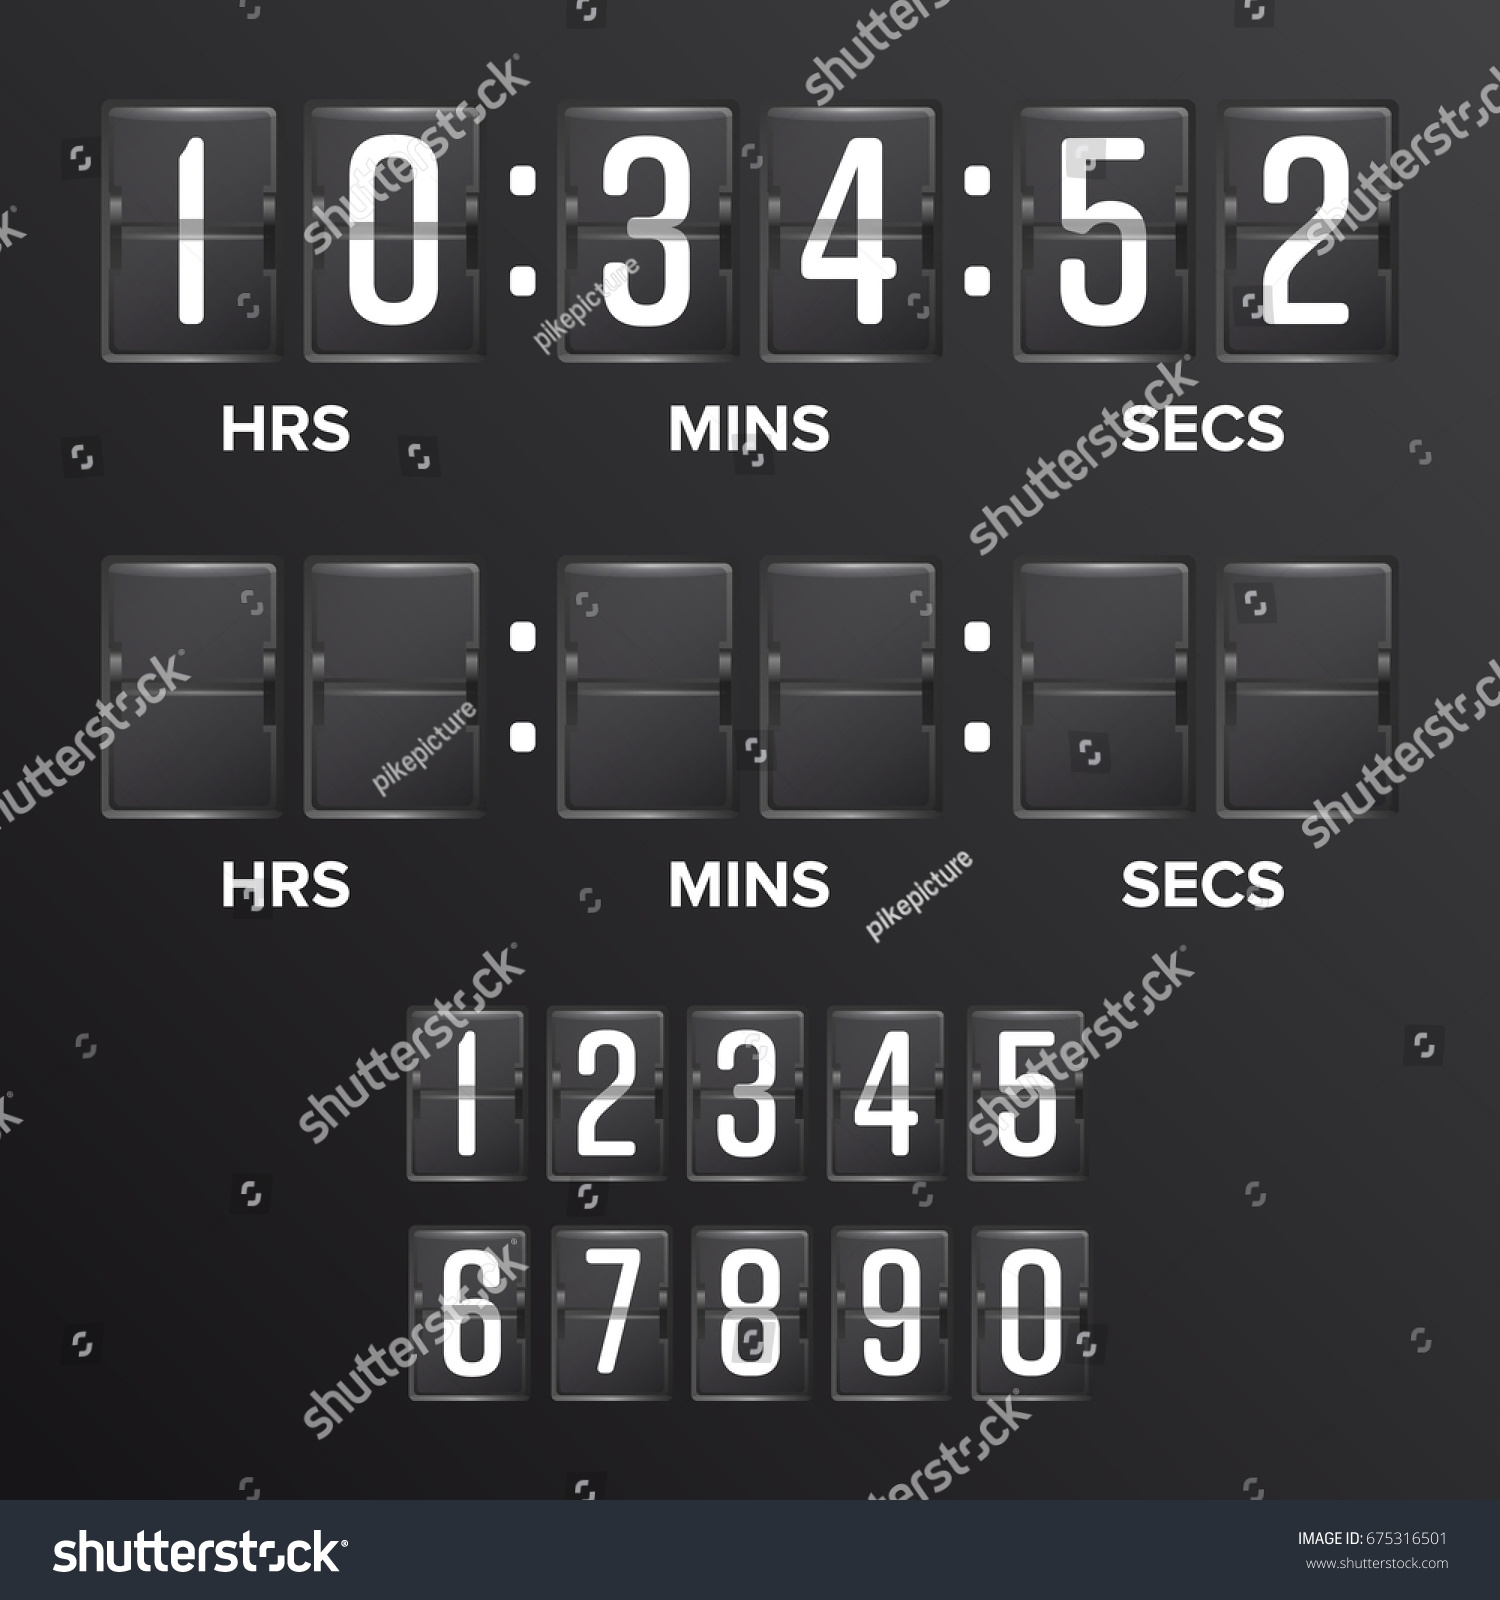 3 mins countdown - Monza berglauf-verband com